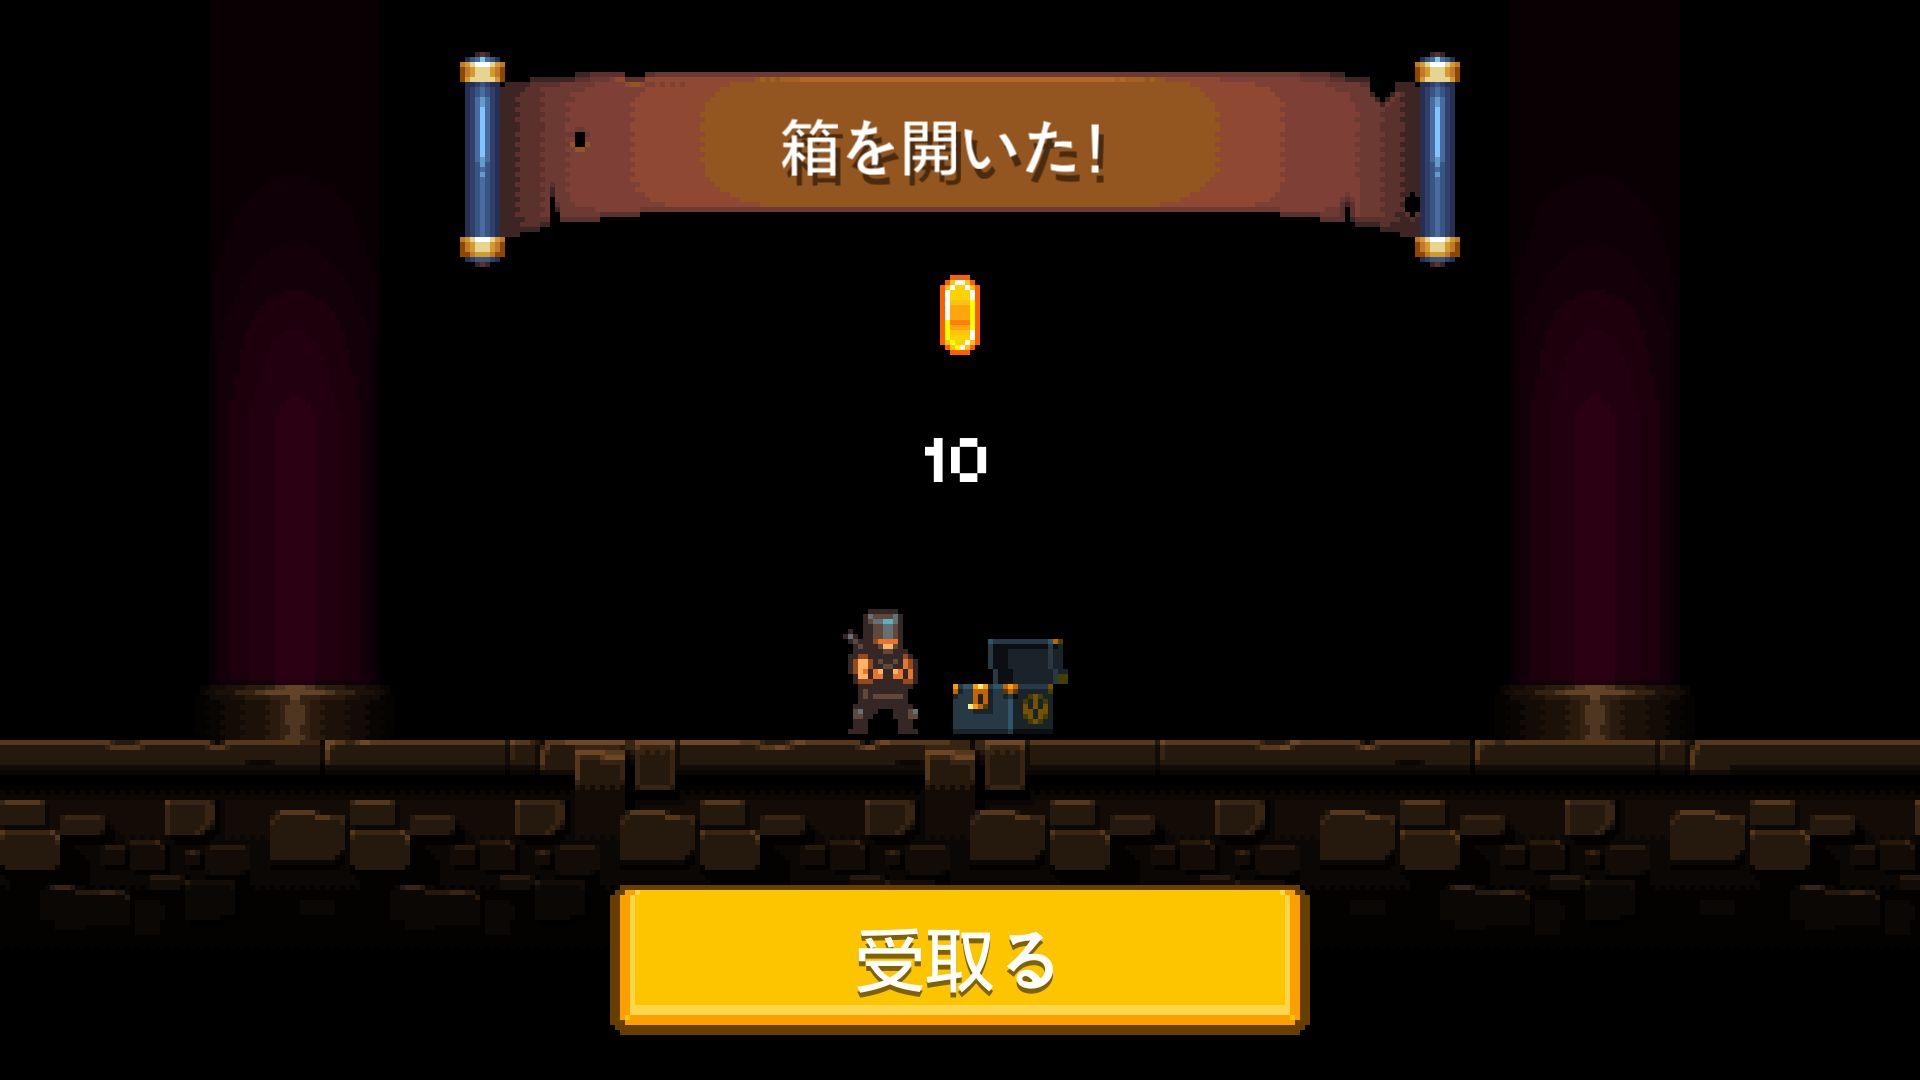 androidアプリ ニンジャオーサム(NinjAwesome)攻略スクリーンショット5